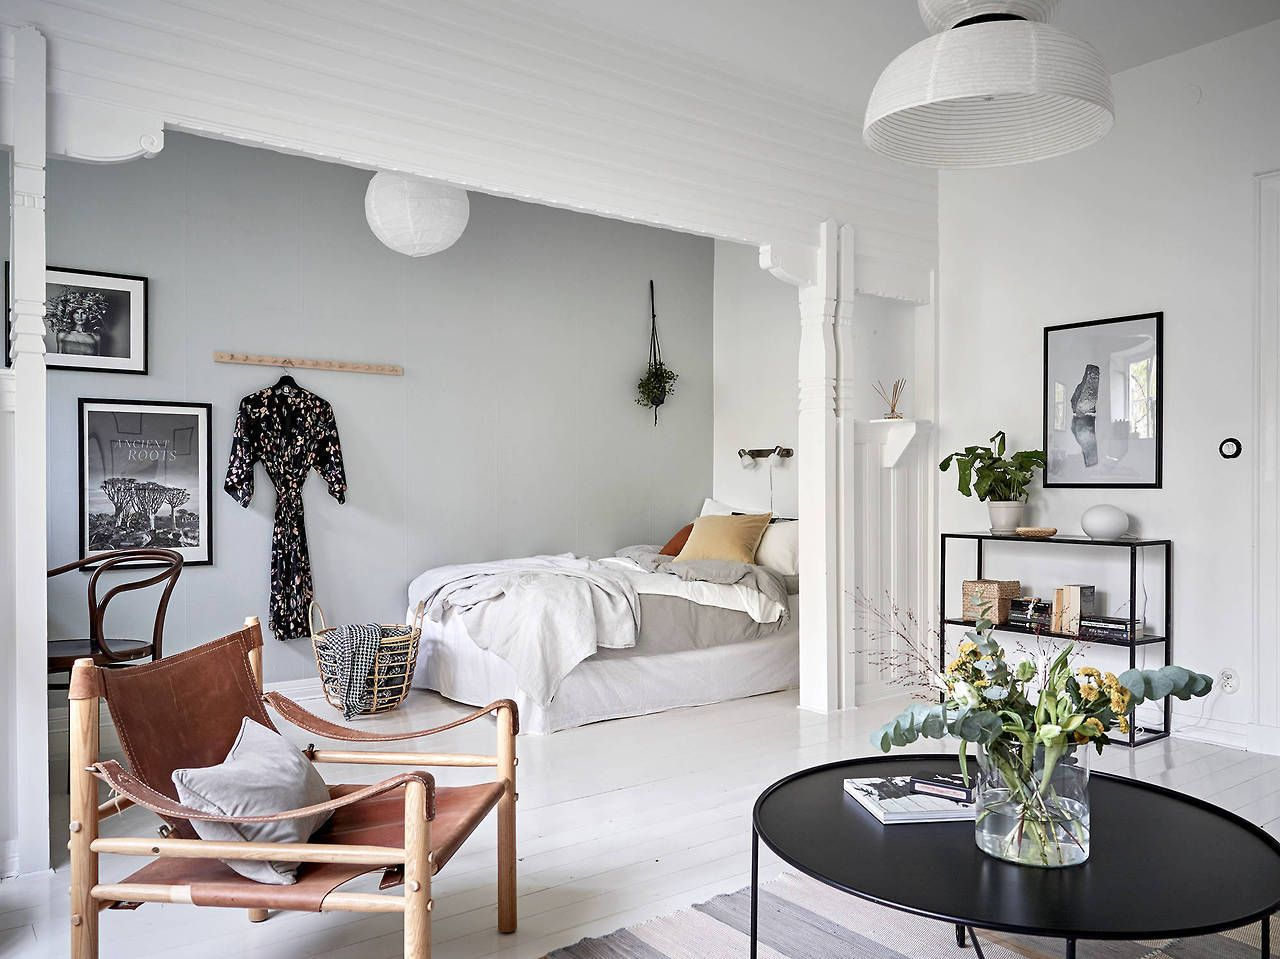 Scandinavian Studio Apartment Decoracion De Interiores Decoracion De Unas Interiores